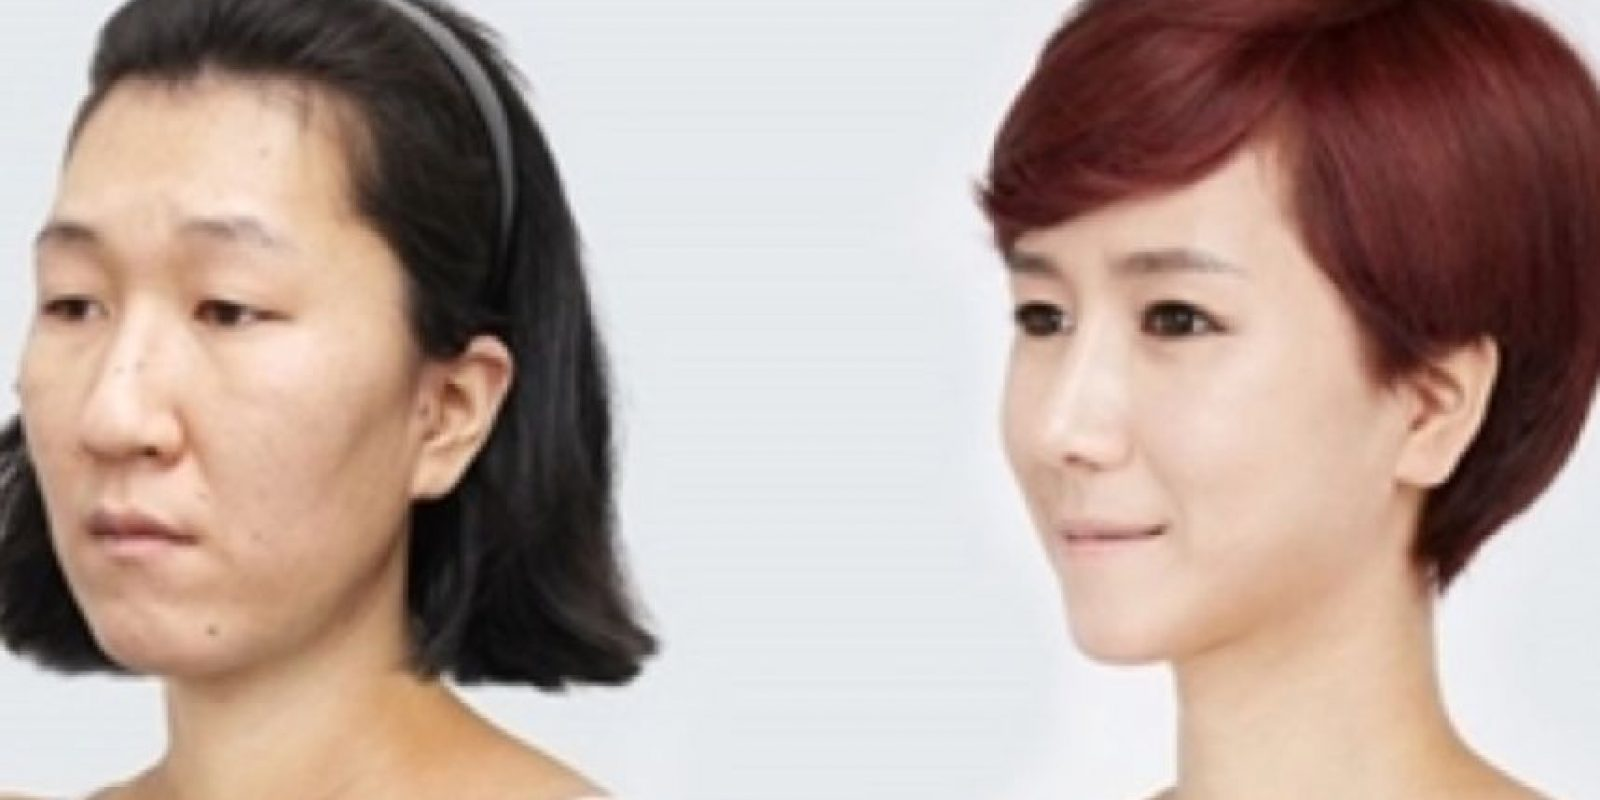 Esta ayuda a triunfar. Foto: vía Korean Plastic Surgery /Tumblr